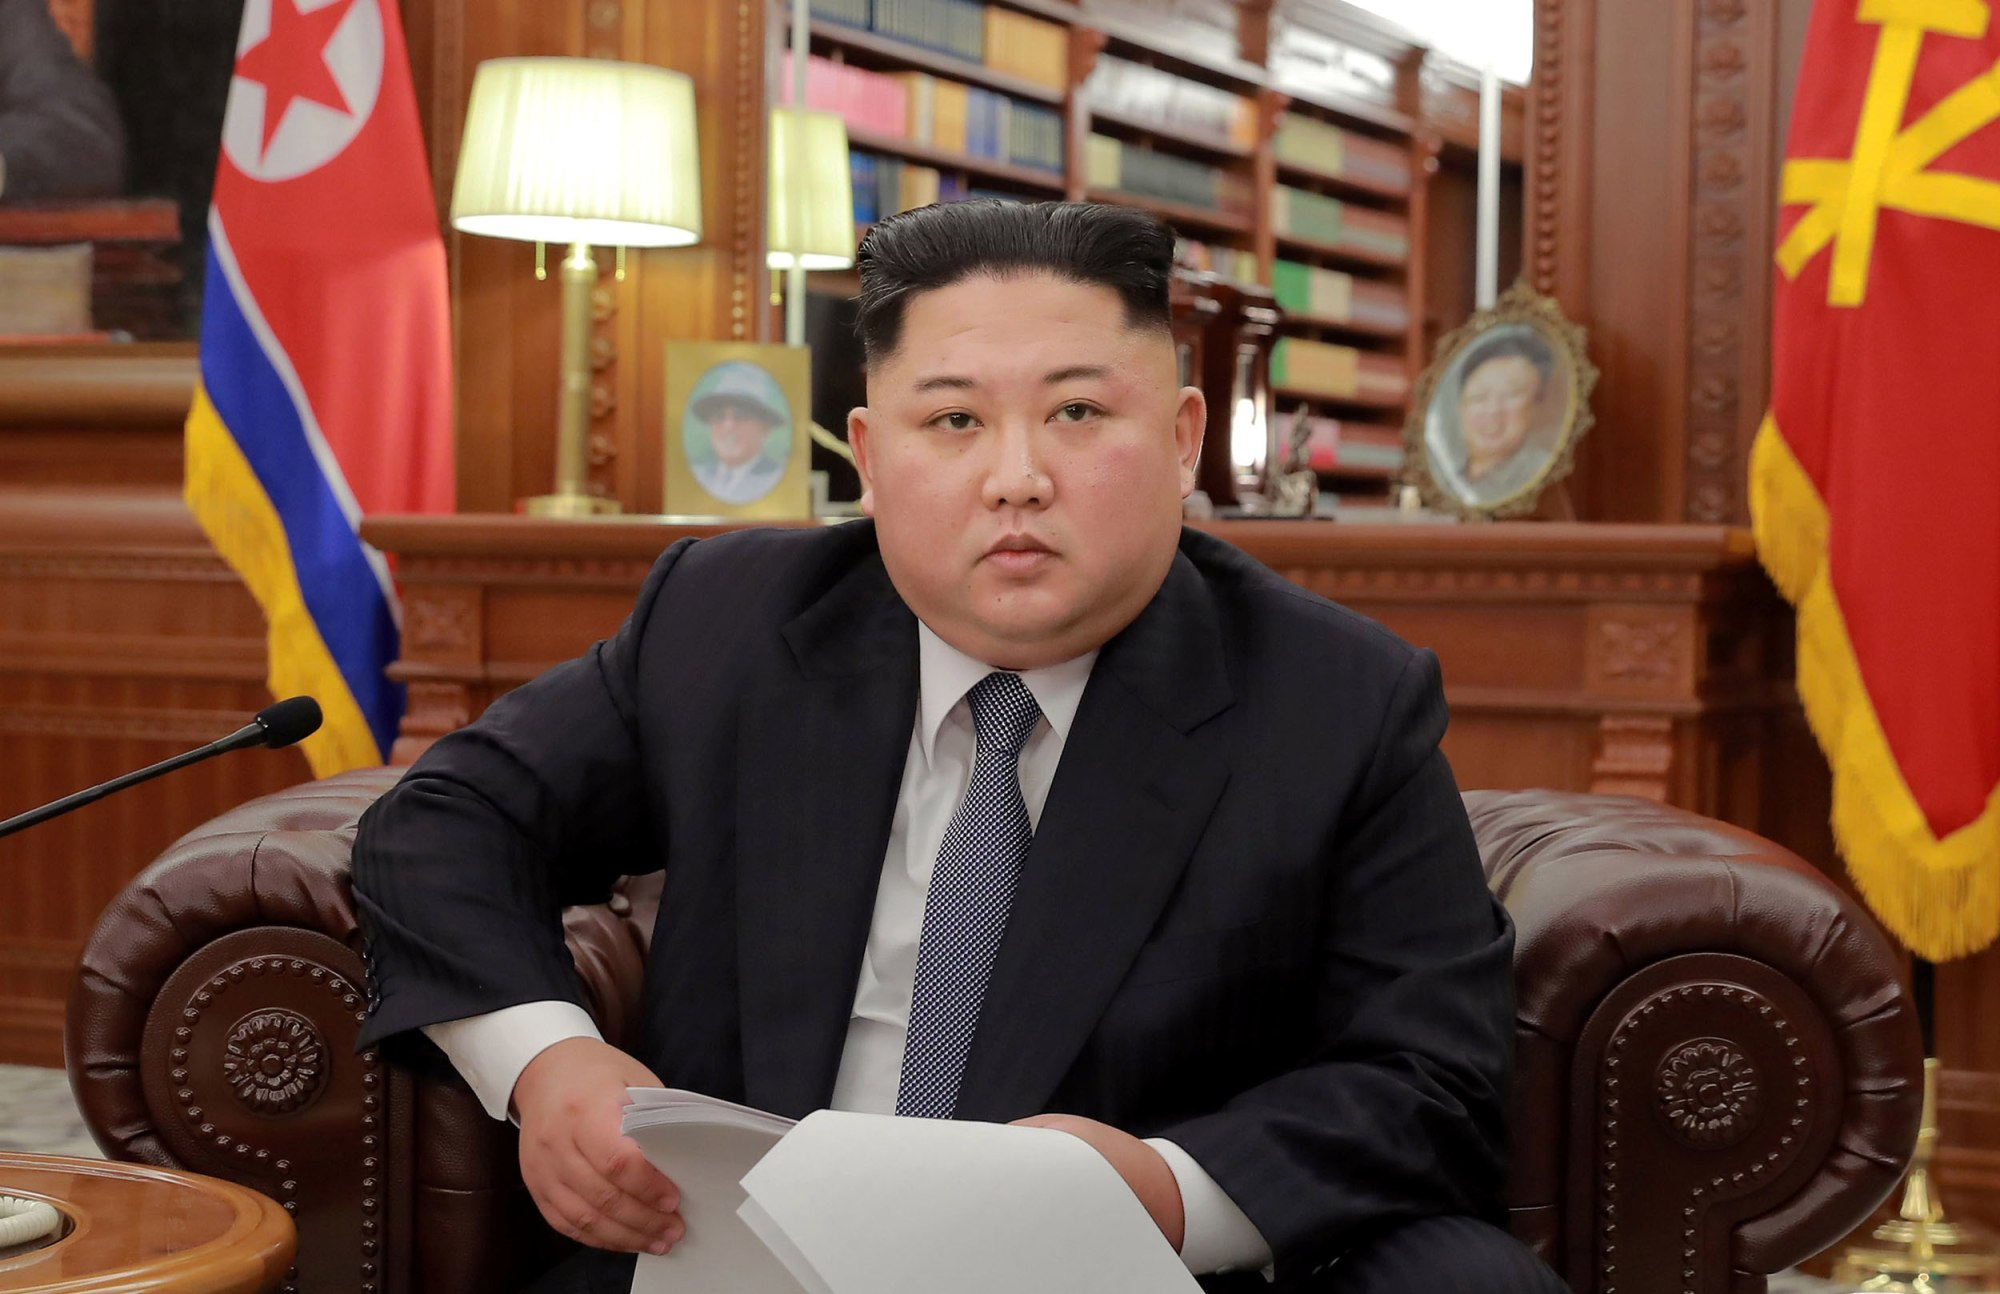 Image: North Korean leader Kim Jong Un poses for photos in Pyongyang